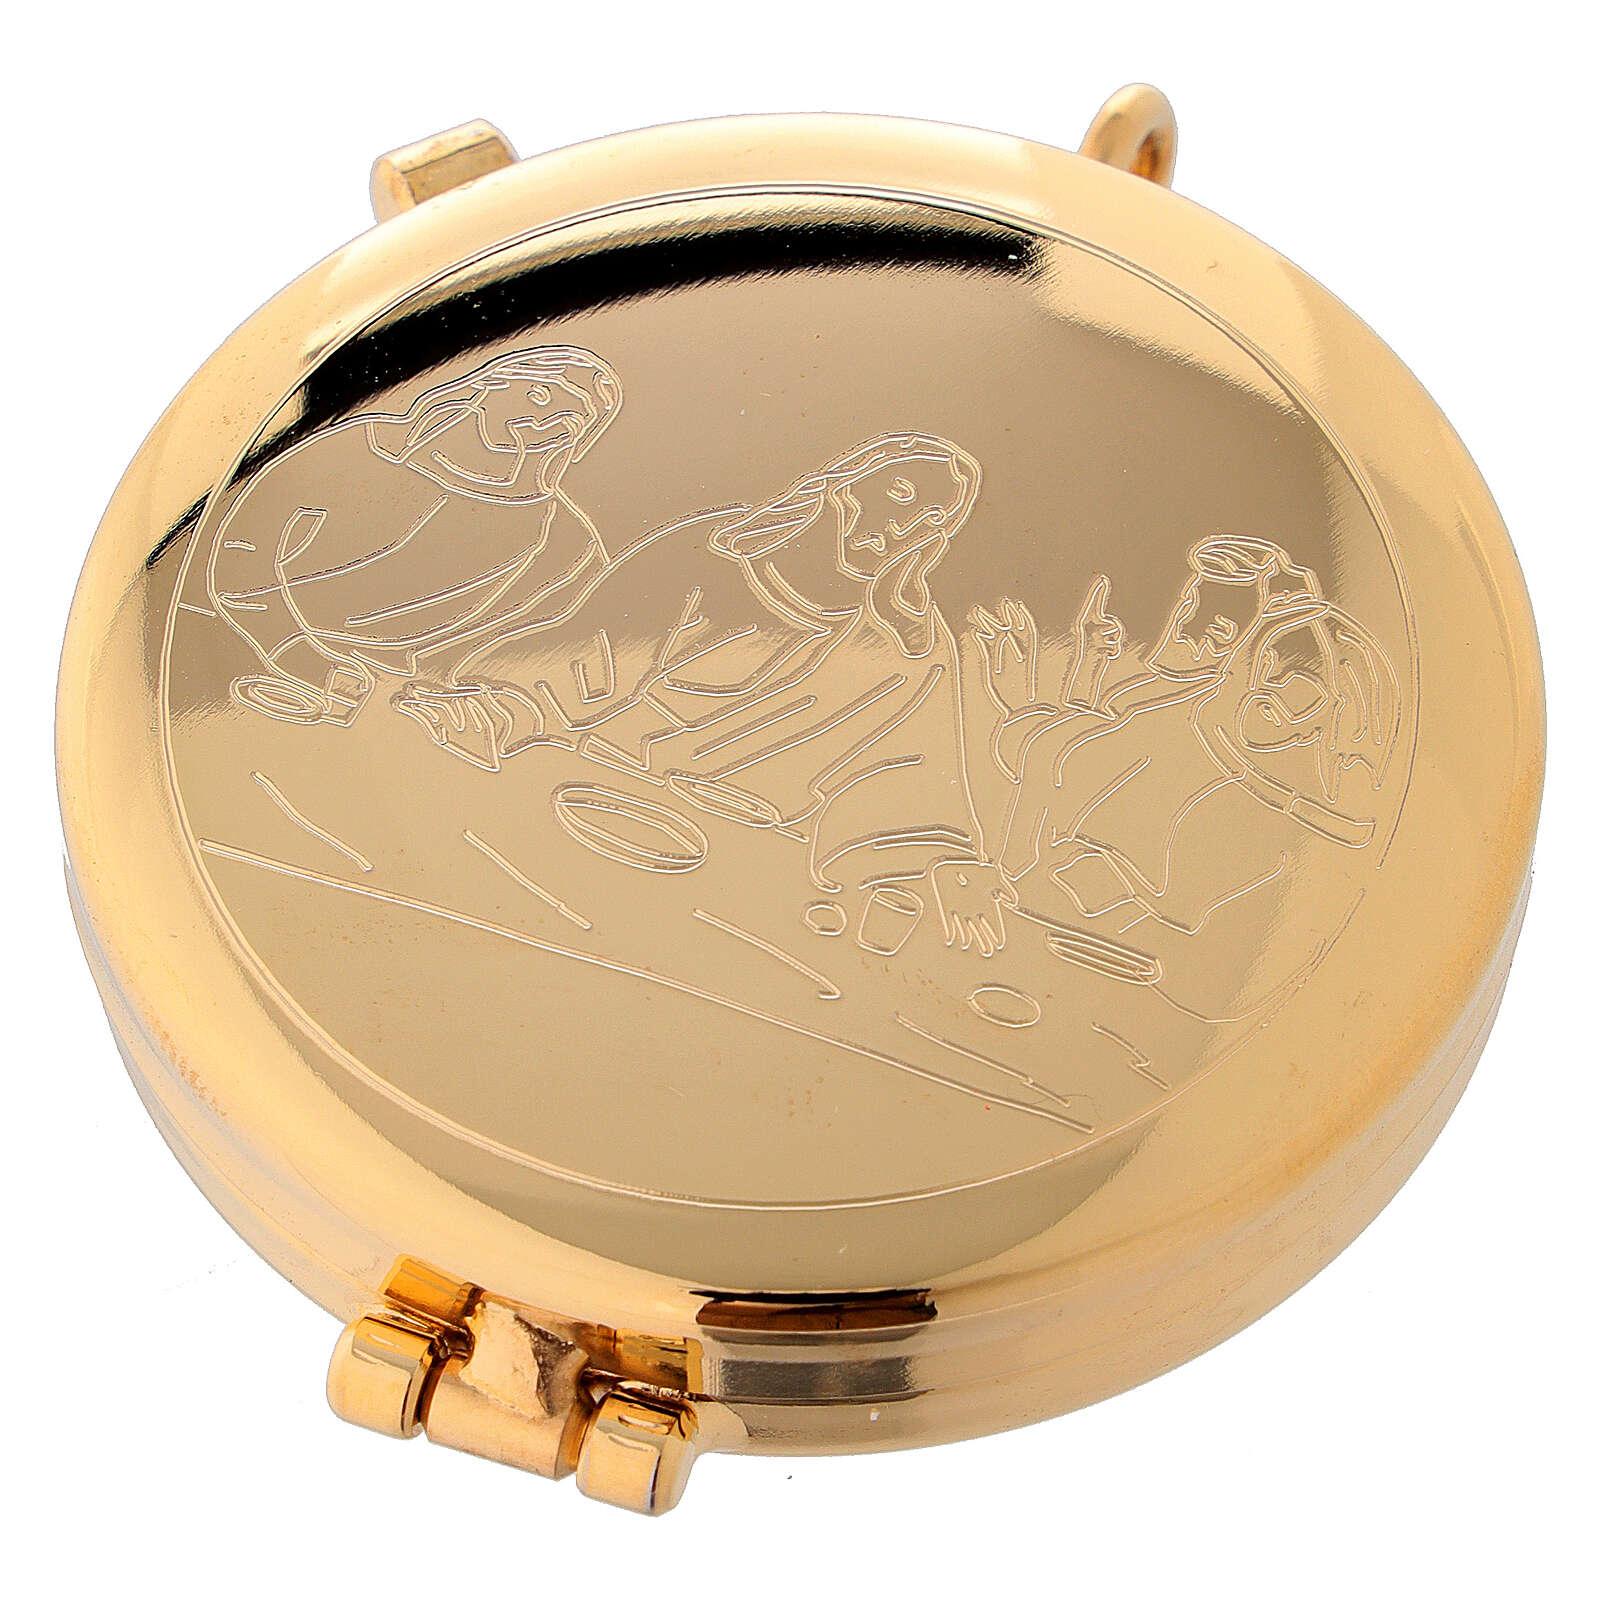 Custode à hosties dorée avec gravure Cène 5,3 cm 3